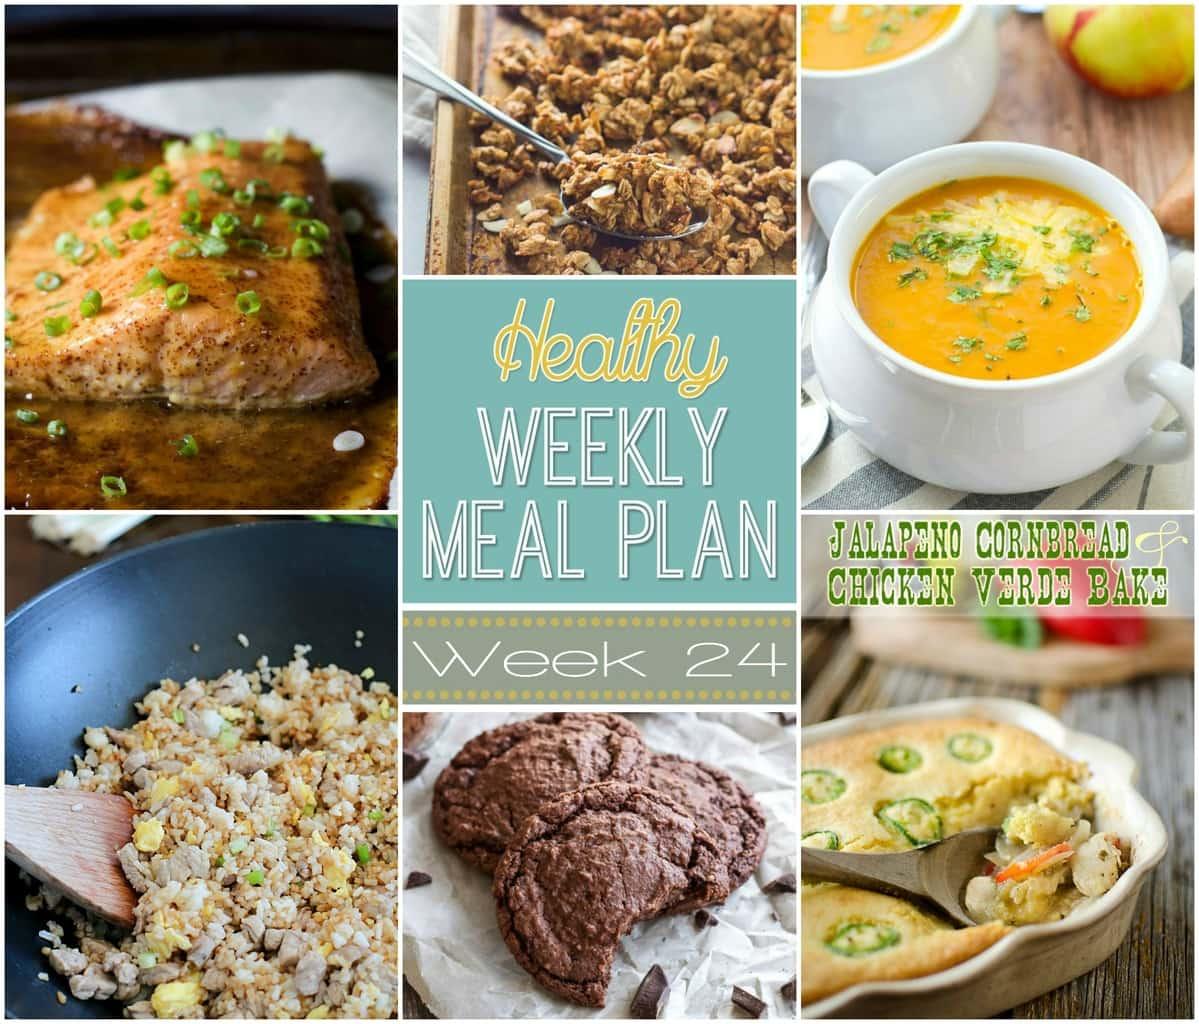 healthy weekly meal plan 24